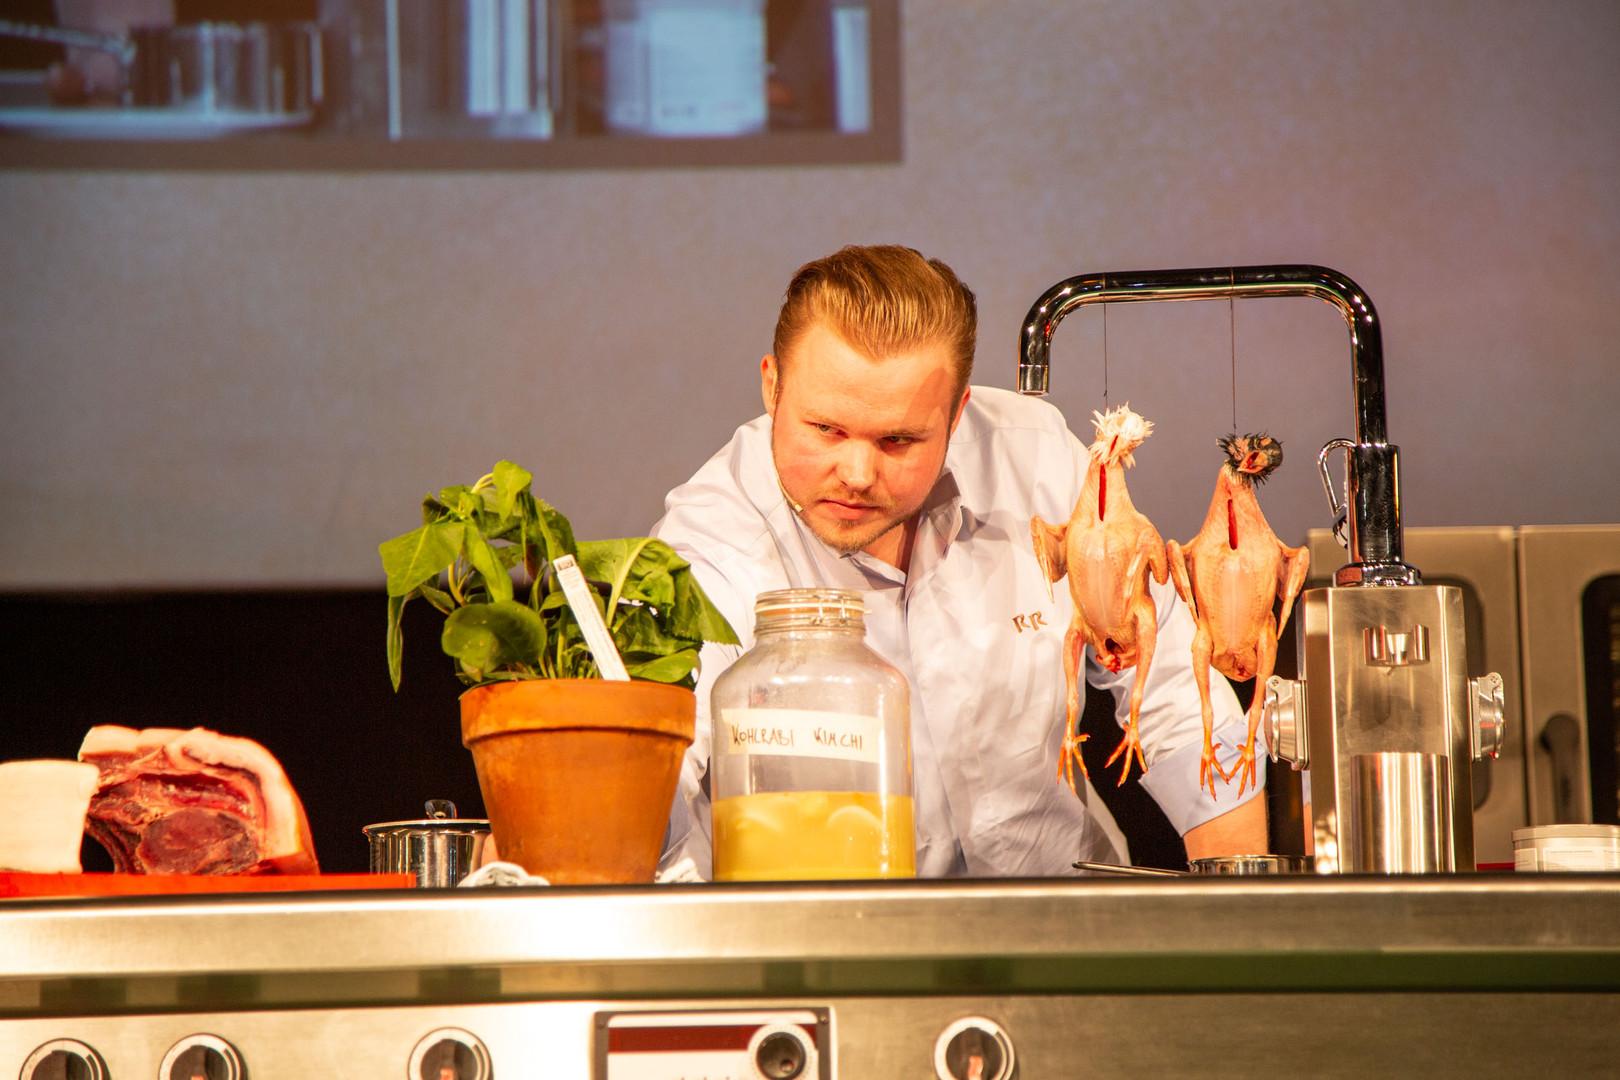 event-chefdays-004.jpg